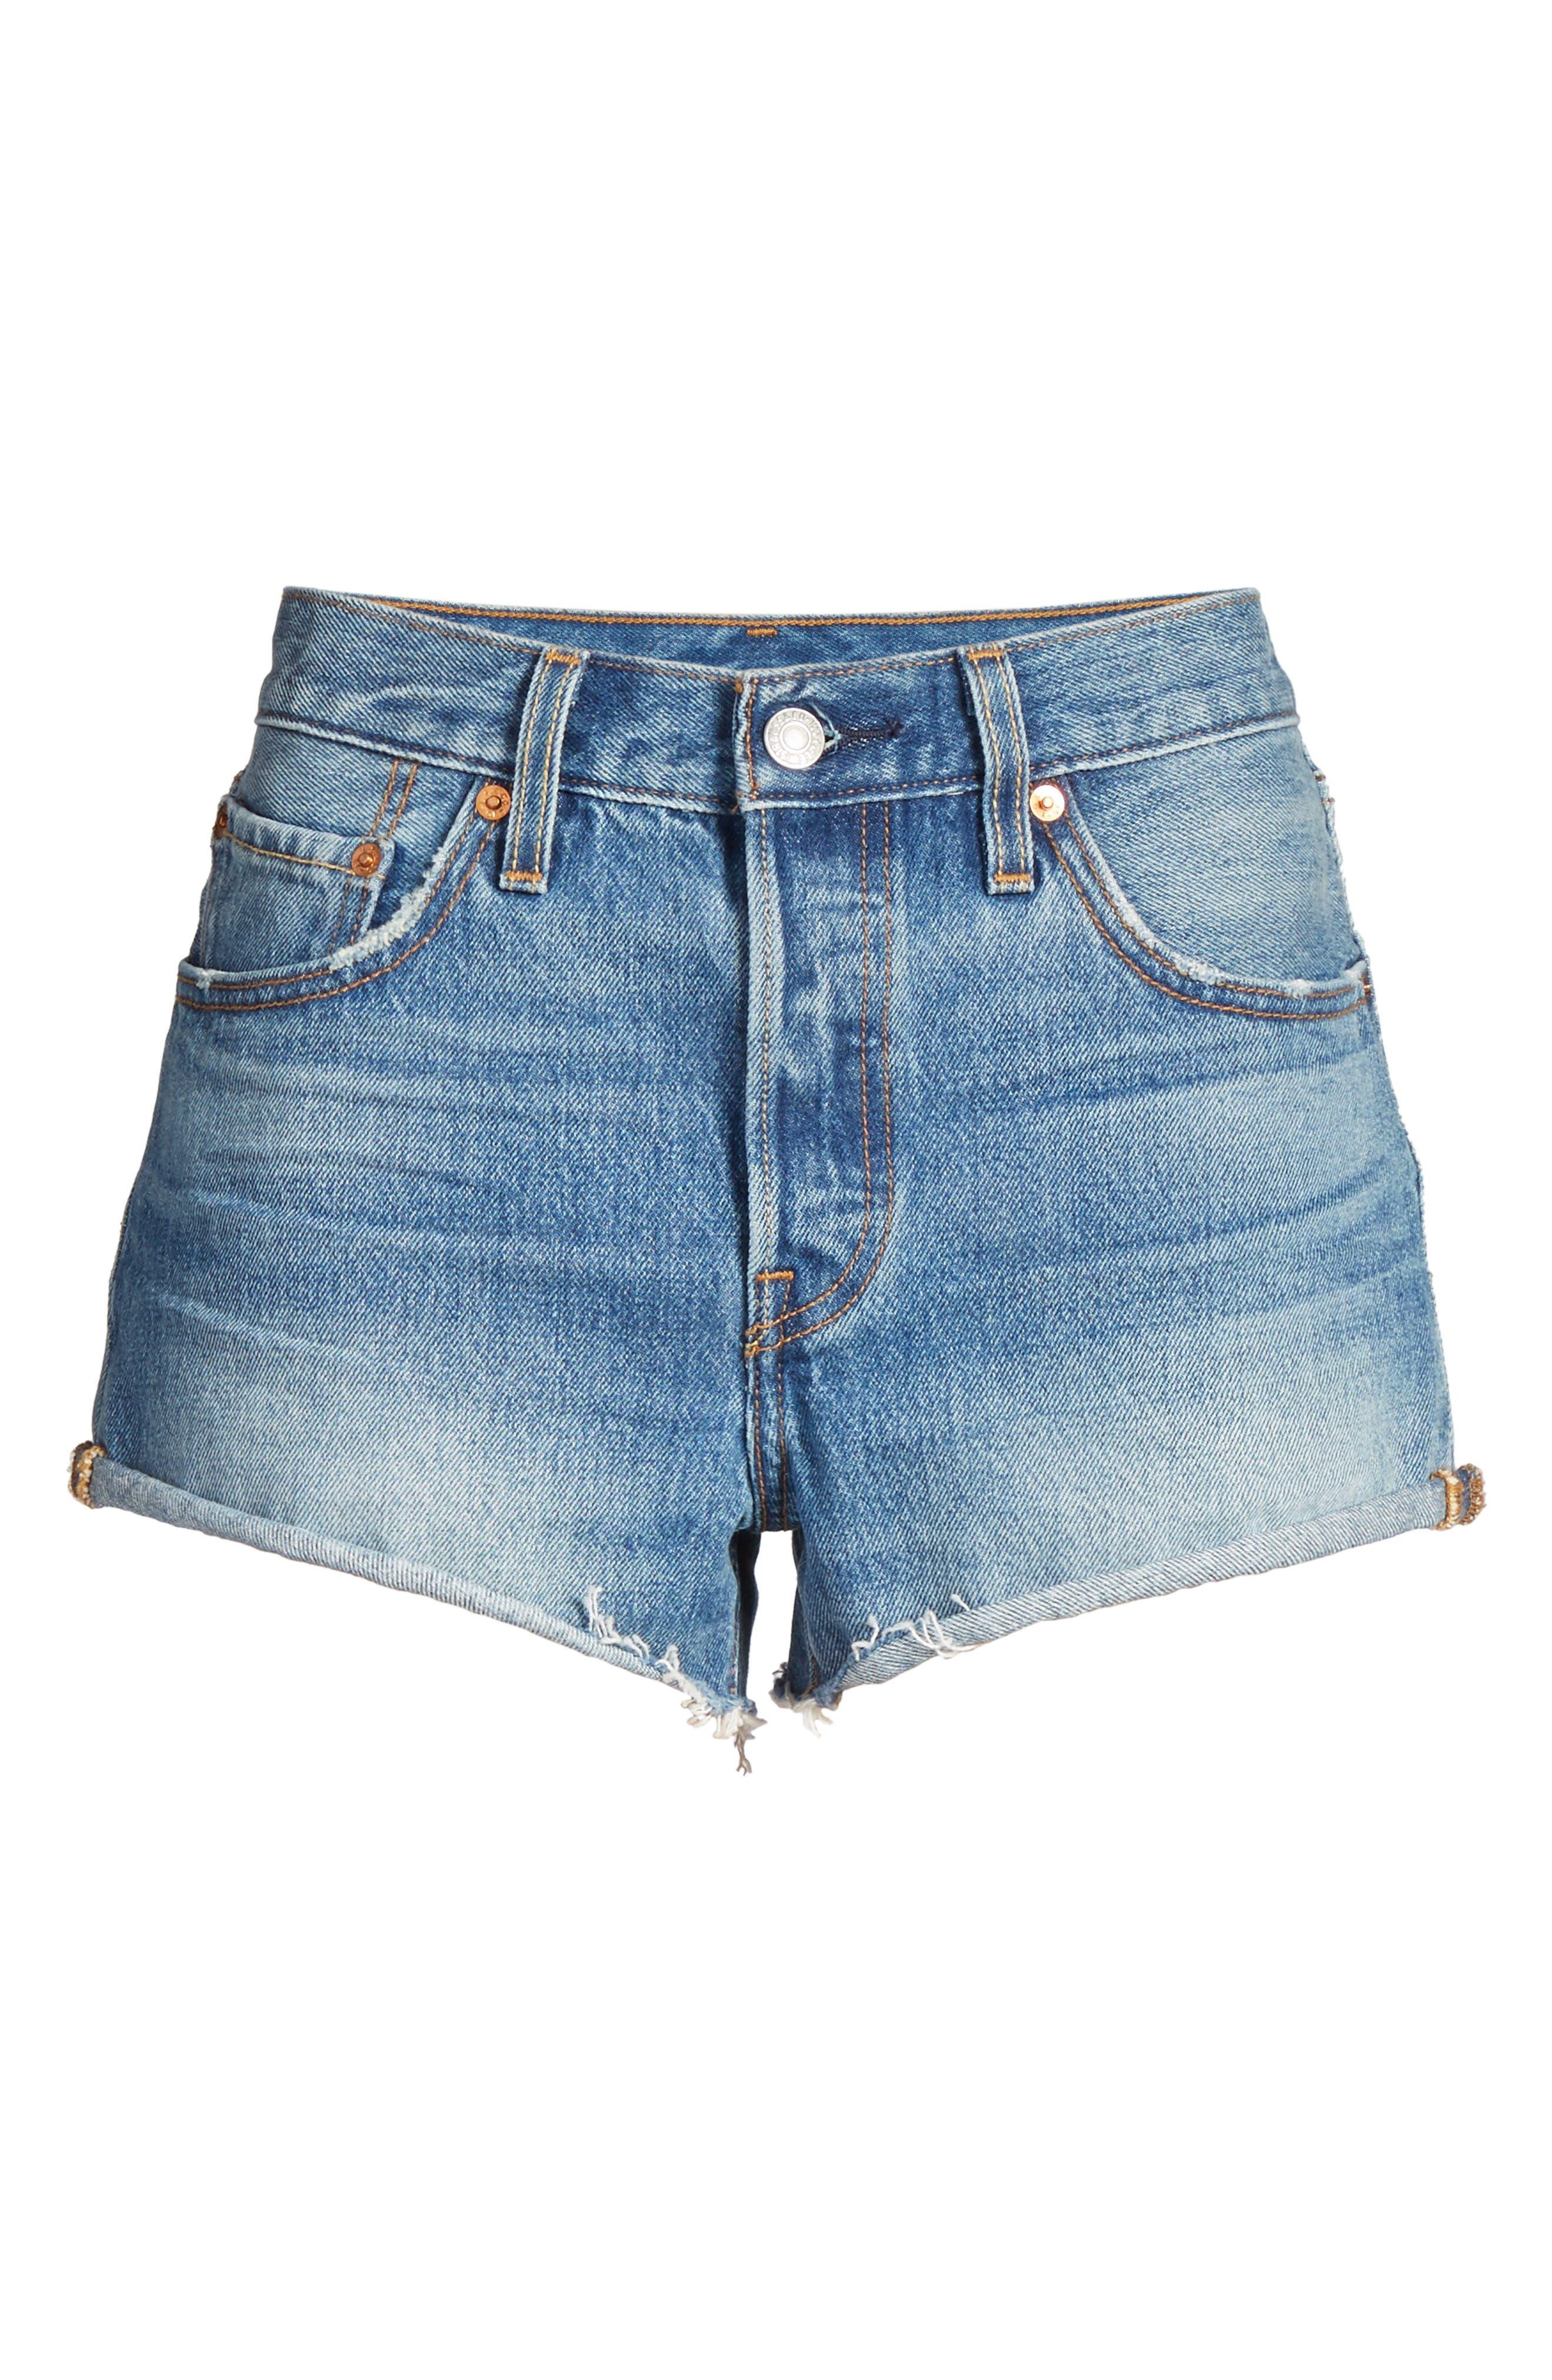 Cutoff Denim Shorts,                             Alternate thumbnail 6, color,